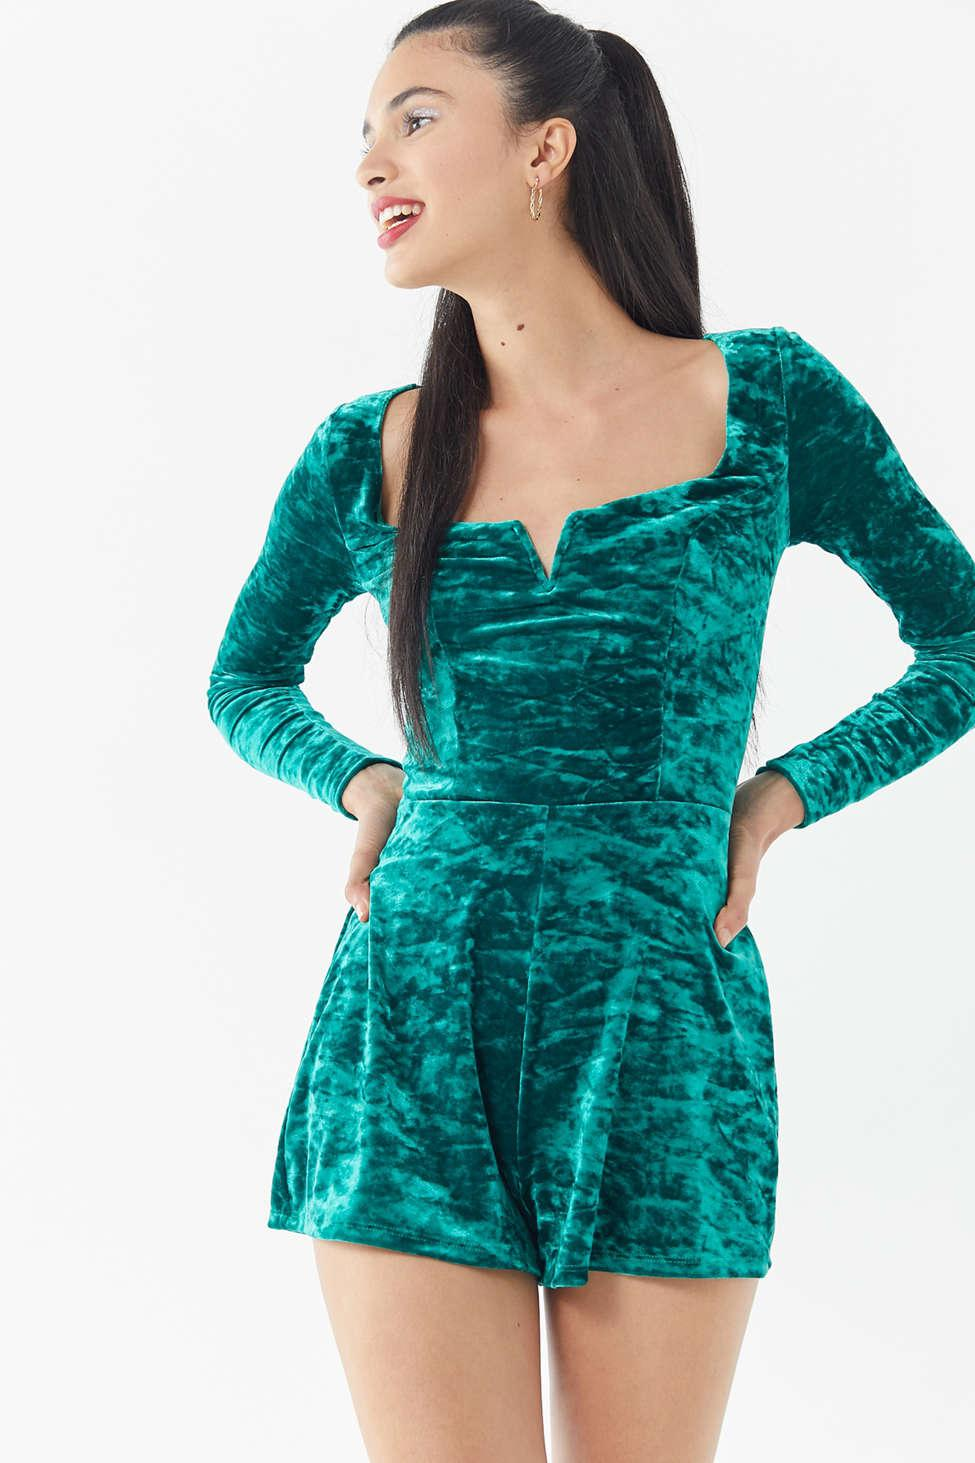 331b017b6ce Urban Outfitters - Green Uo Sasha Crushed Velvet Romper - Lyst. View  fullscreen